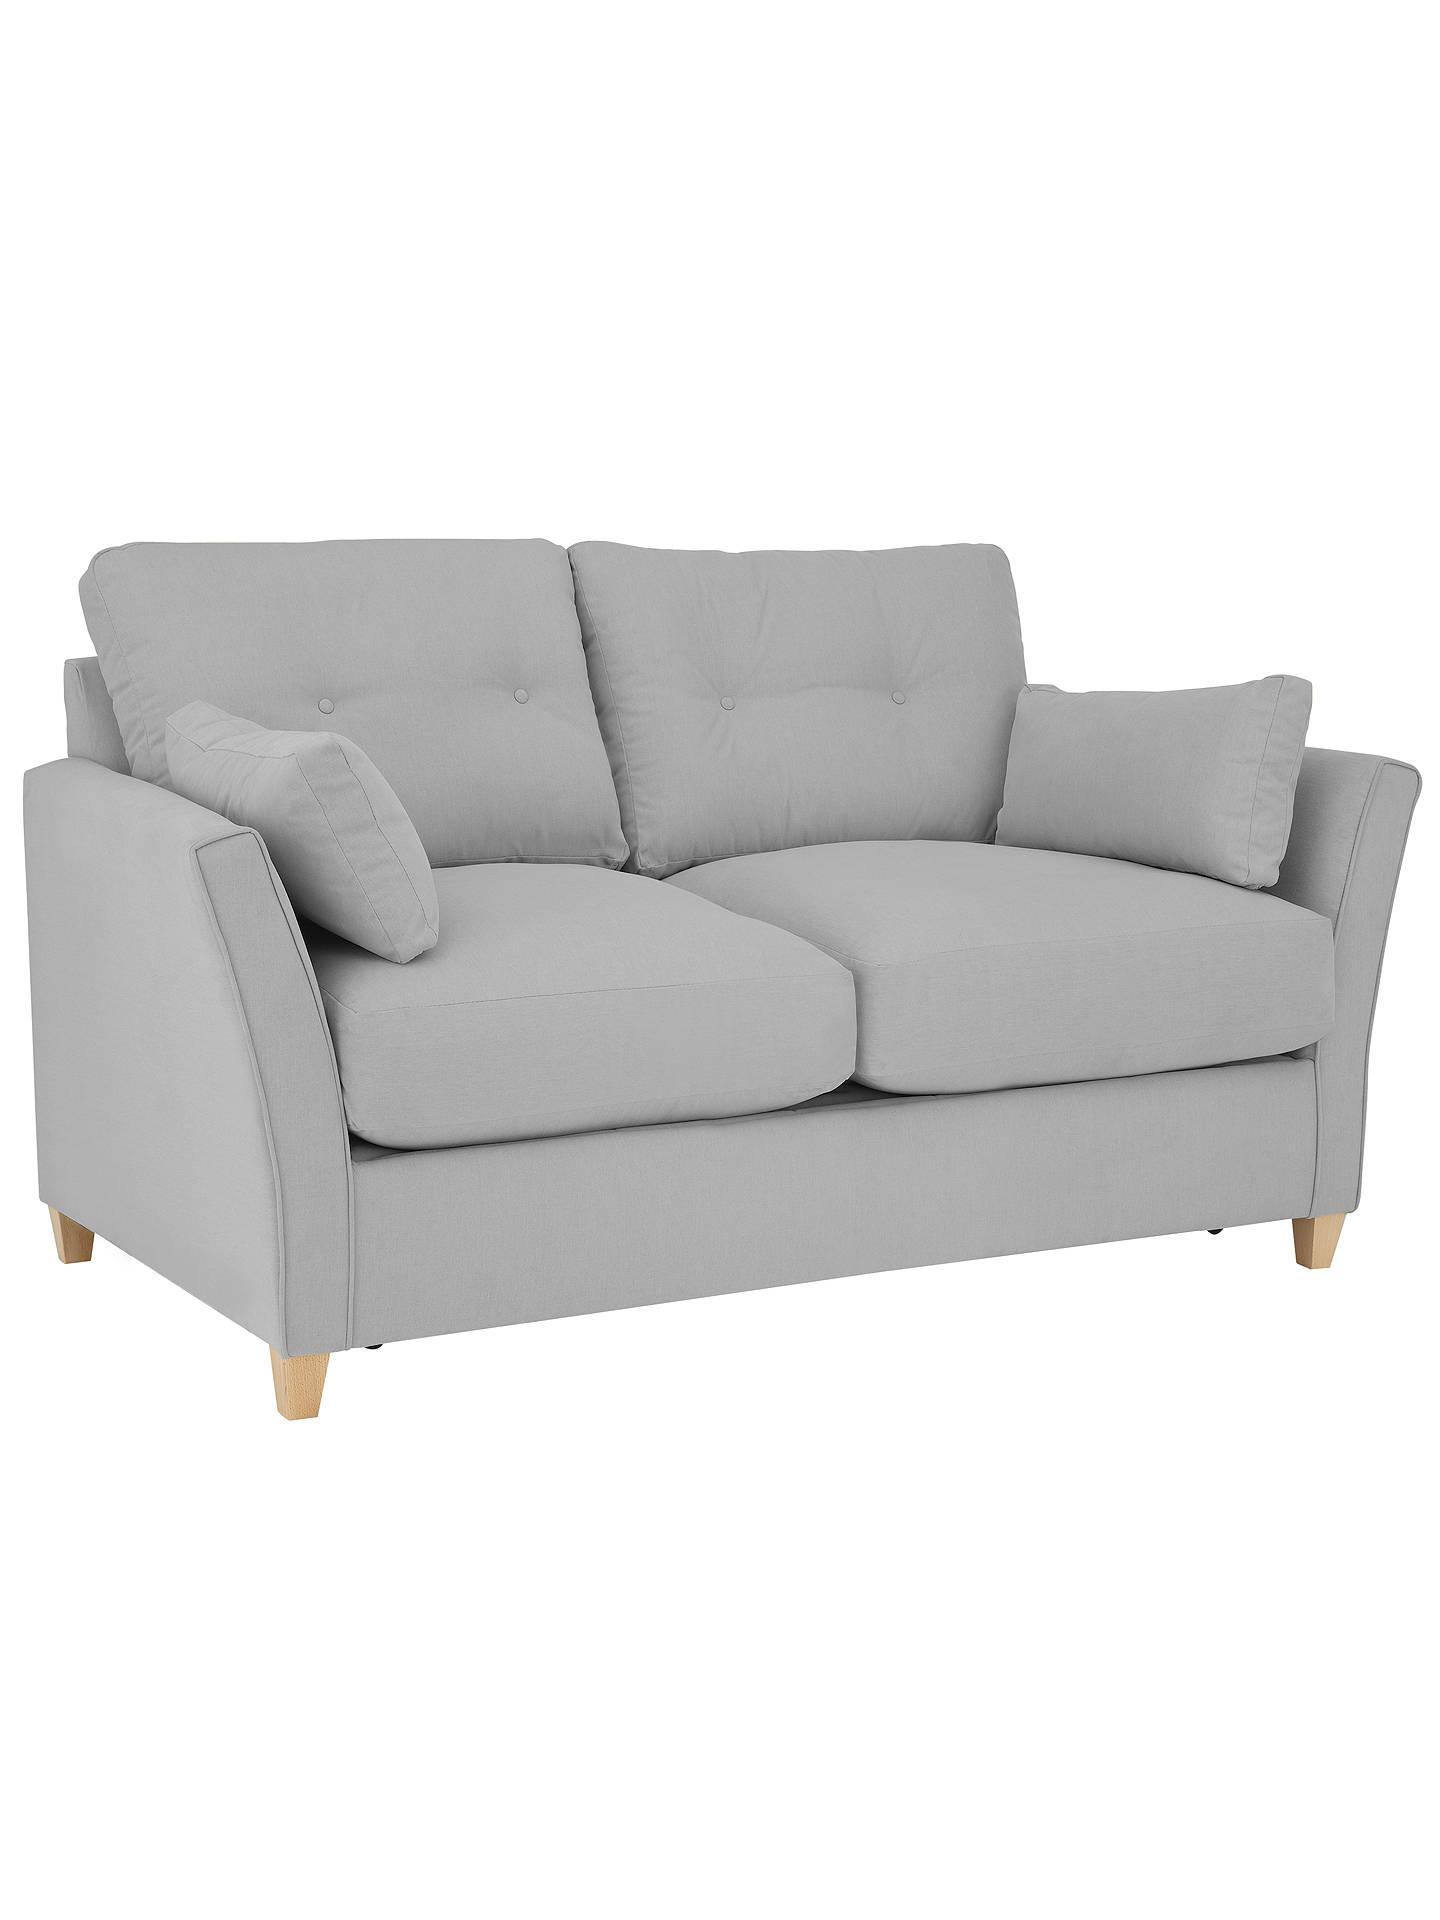 Buyjohn lewis partners chopin small memory foam sofa bed online at johnlewis